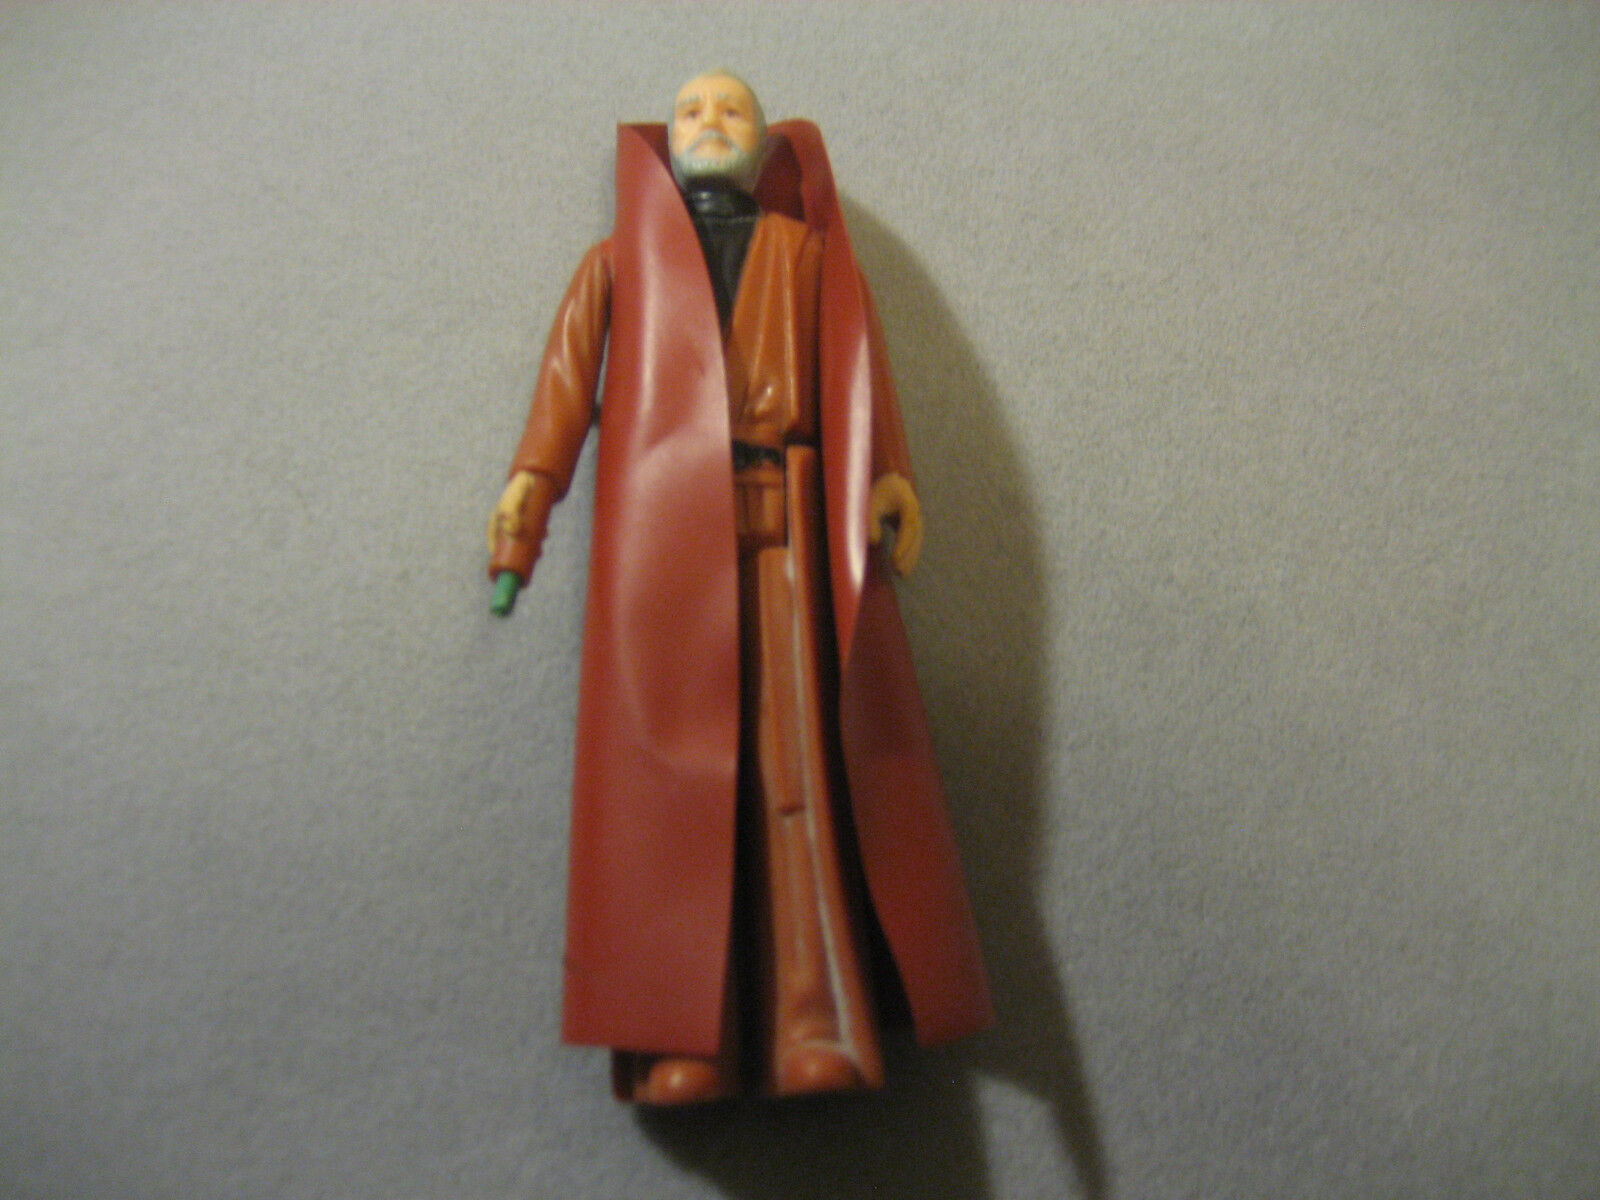 Star wars, jahrgang 1977, obi - wan kenobi obi - wan - coo 3,75  graue haare